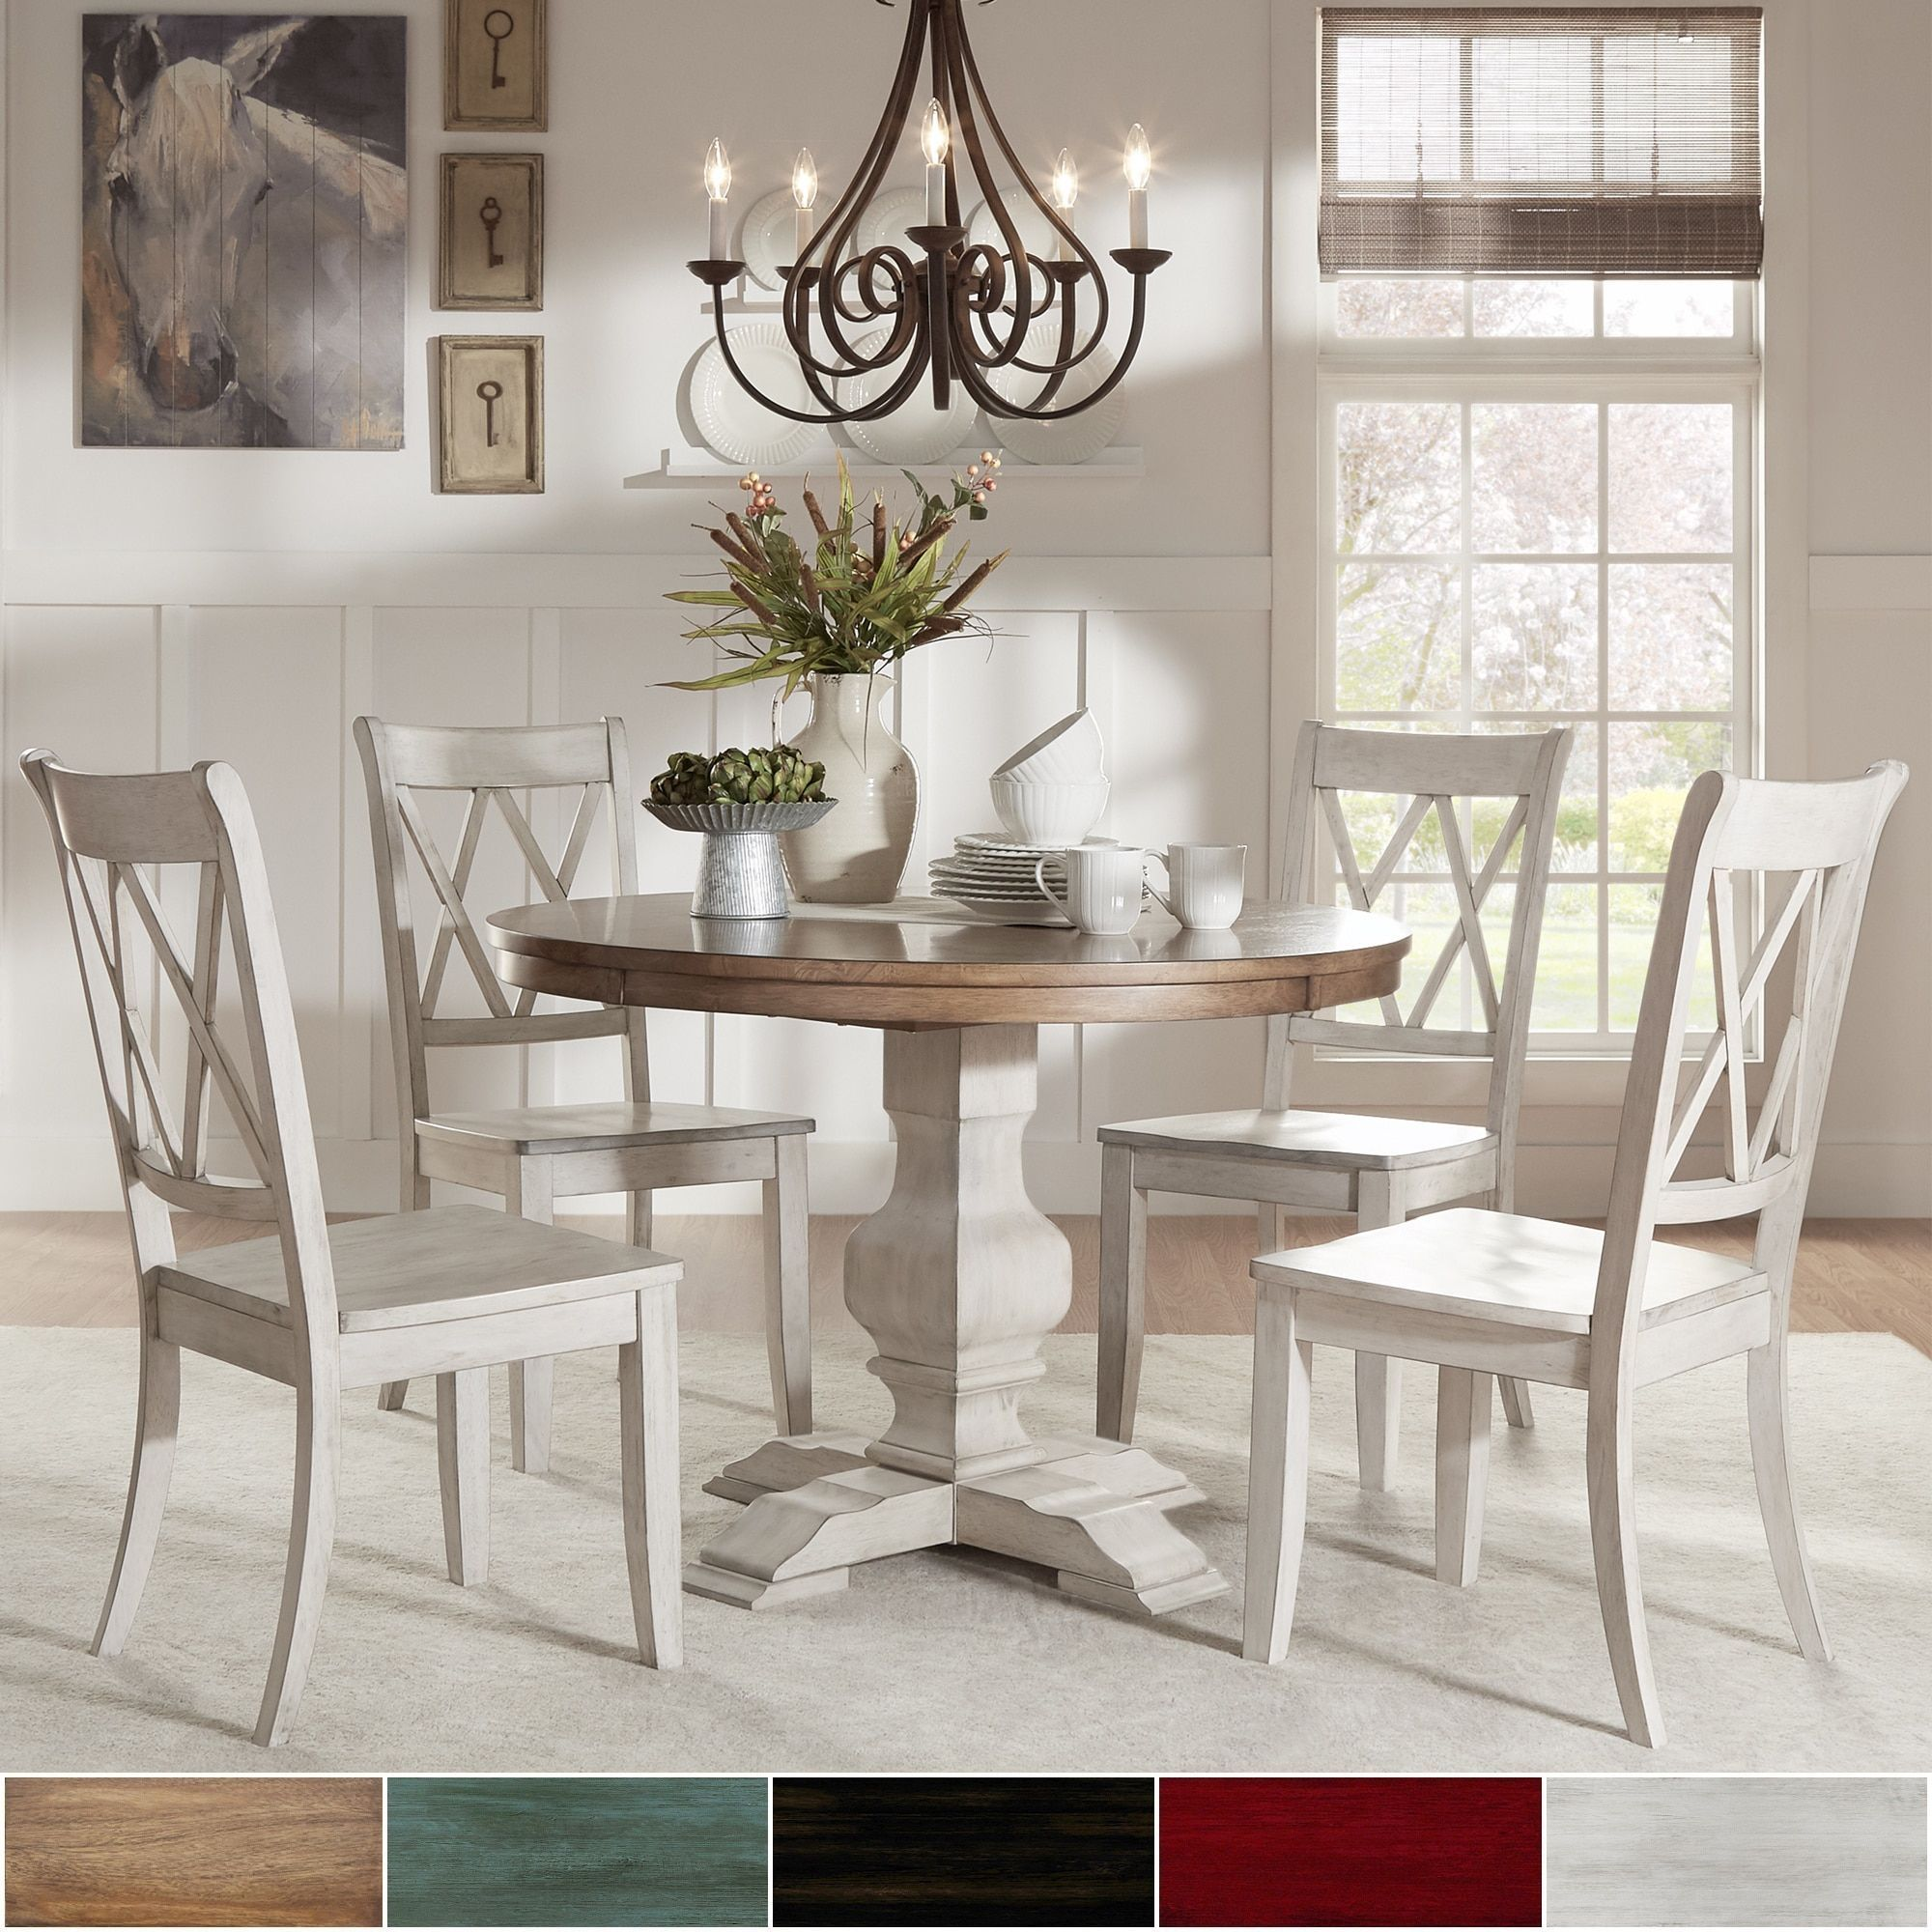 Amazing Eleanor Antique White Round Solid Wood Top 5 Piece Dining Ibusinesslaw Wood Chair Design Ideas Ibusinesslaworg